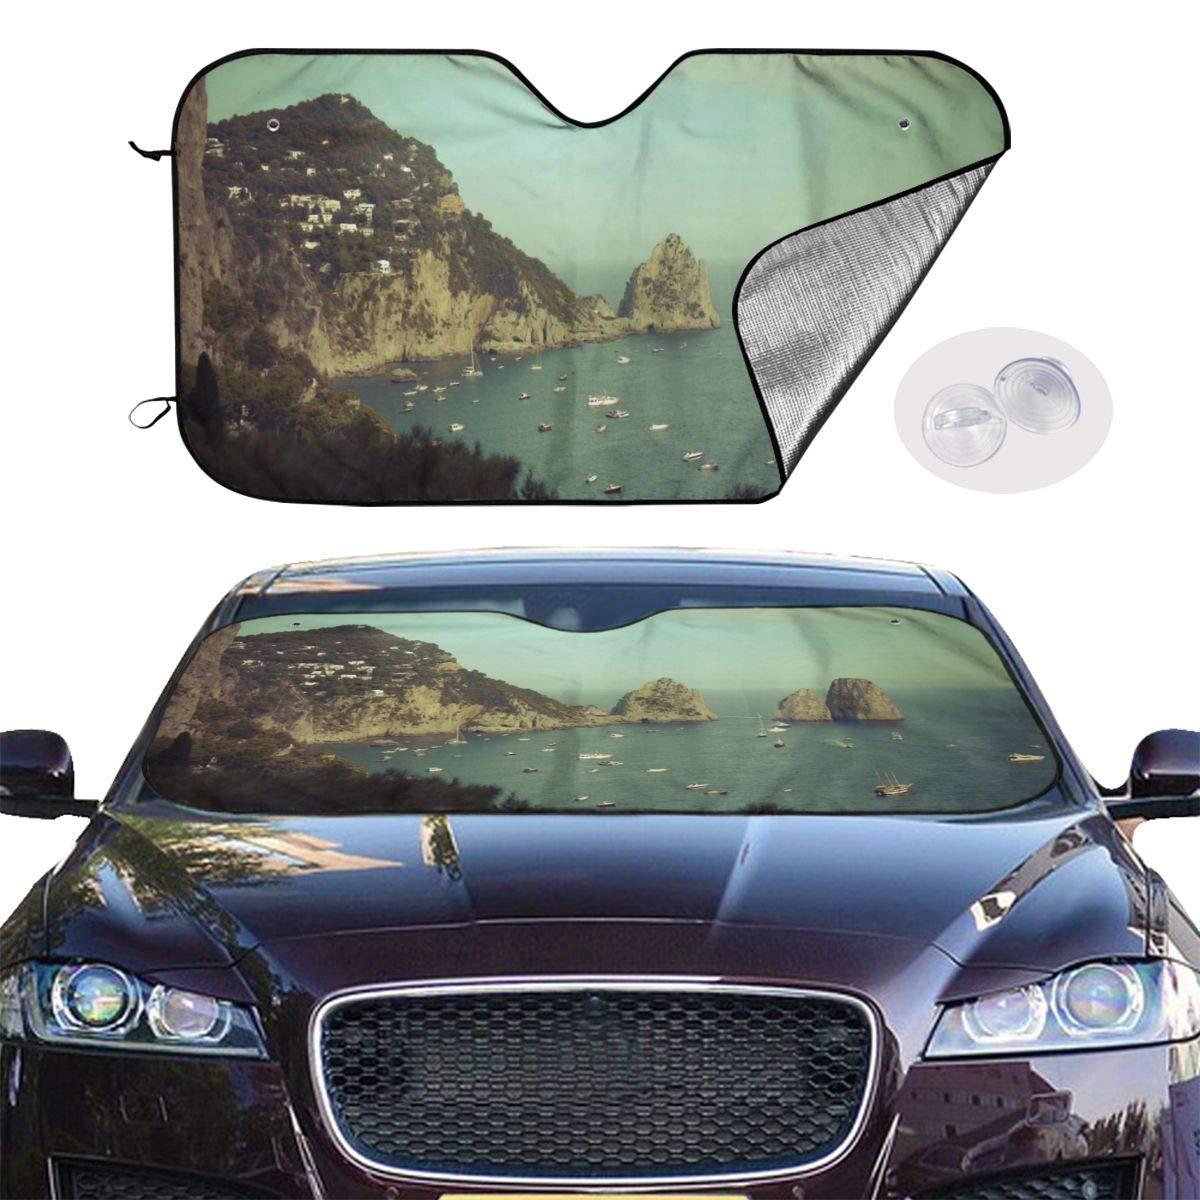 Amalphi Coast,Capri Italy Car Sunshade Window Windscreen Cover,Automotive Window Protector Sunshade Uv Sun and Heat Reflector for Car Truck SUV,Keep Your Vehicle Cool and Damage Free